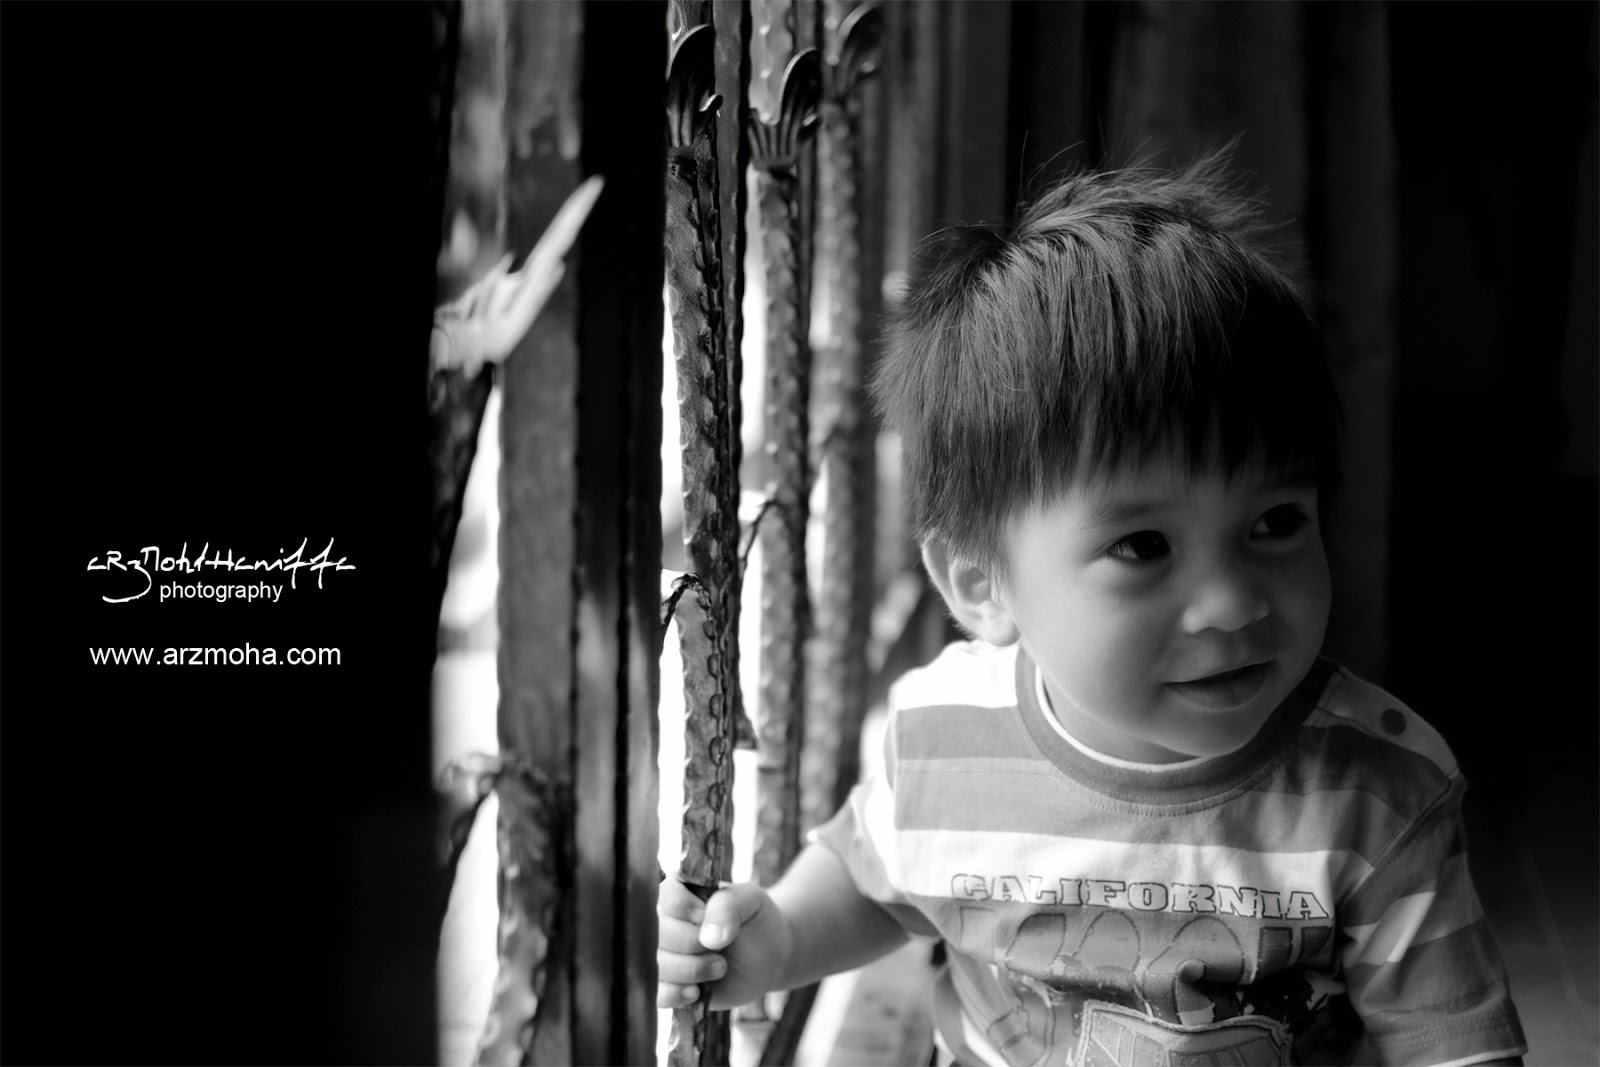 black and white, kids, baby, kids photography, boy, kids world, gambar cantik, kanak-kanak comel